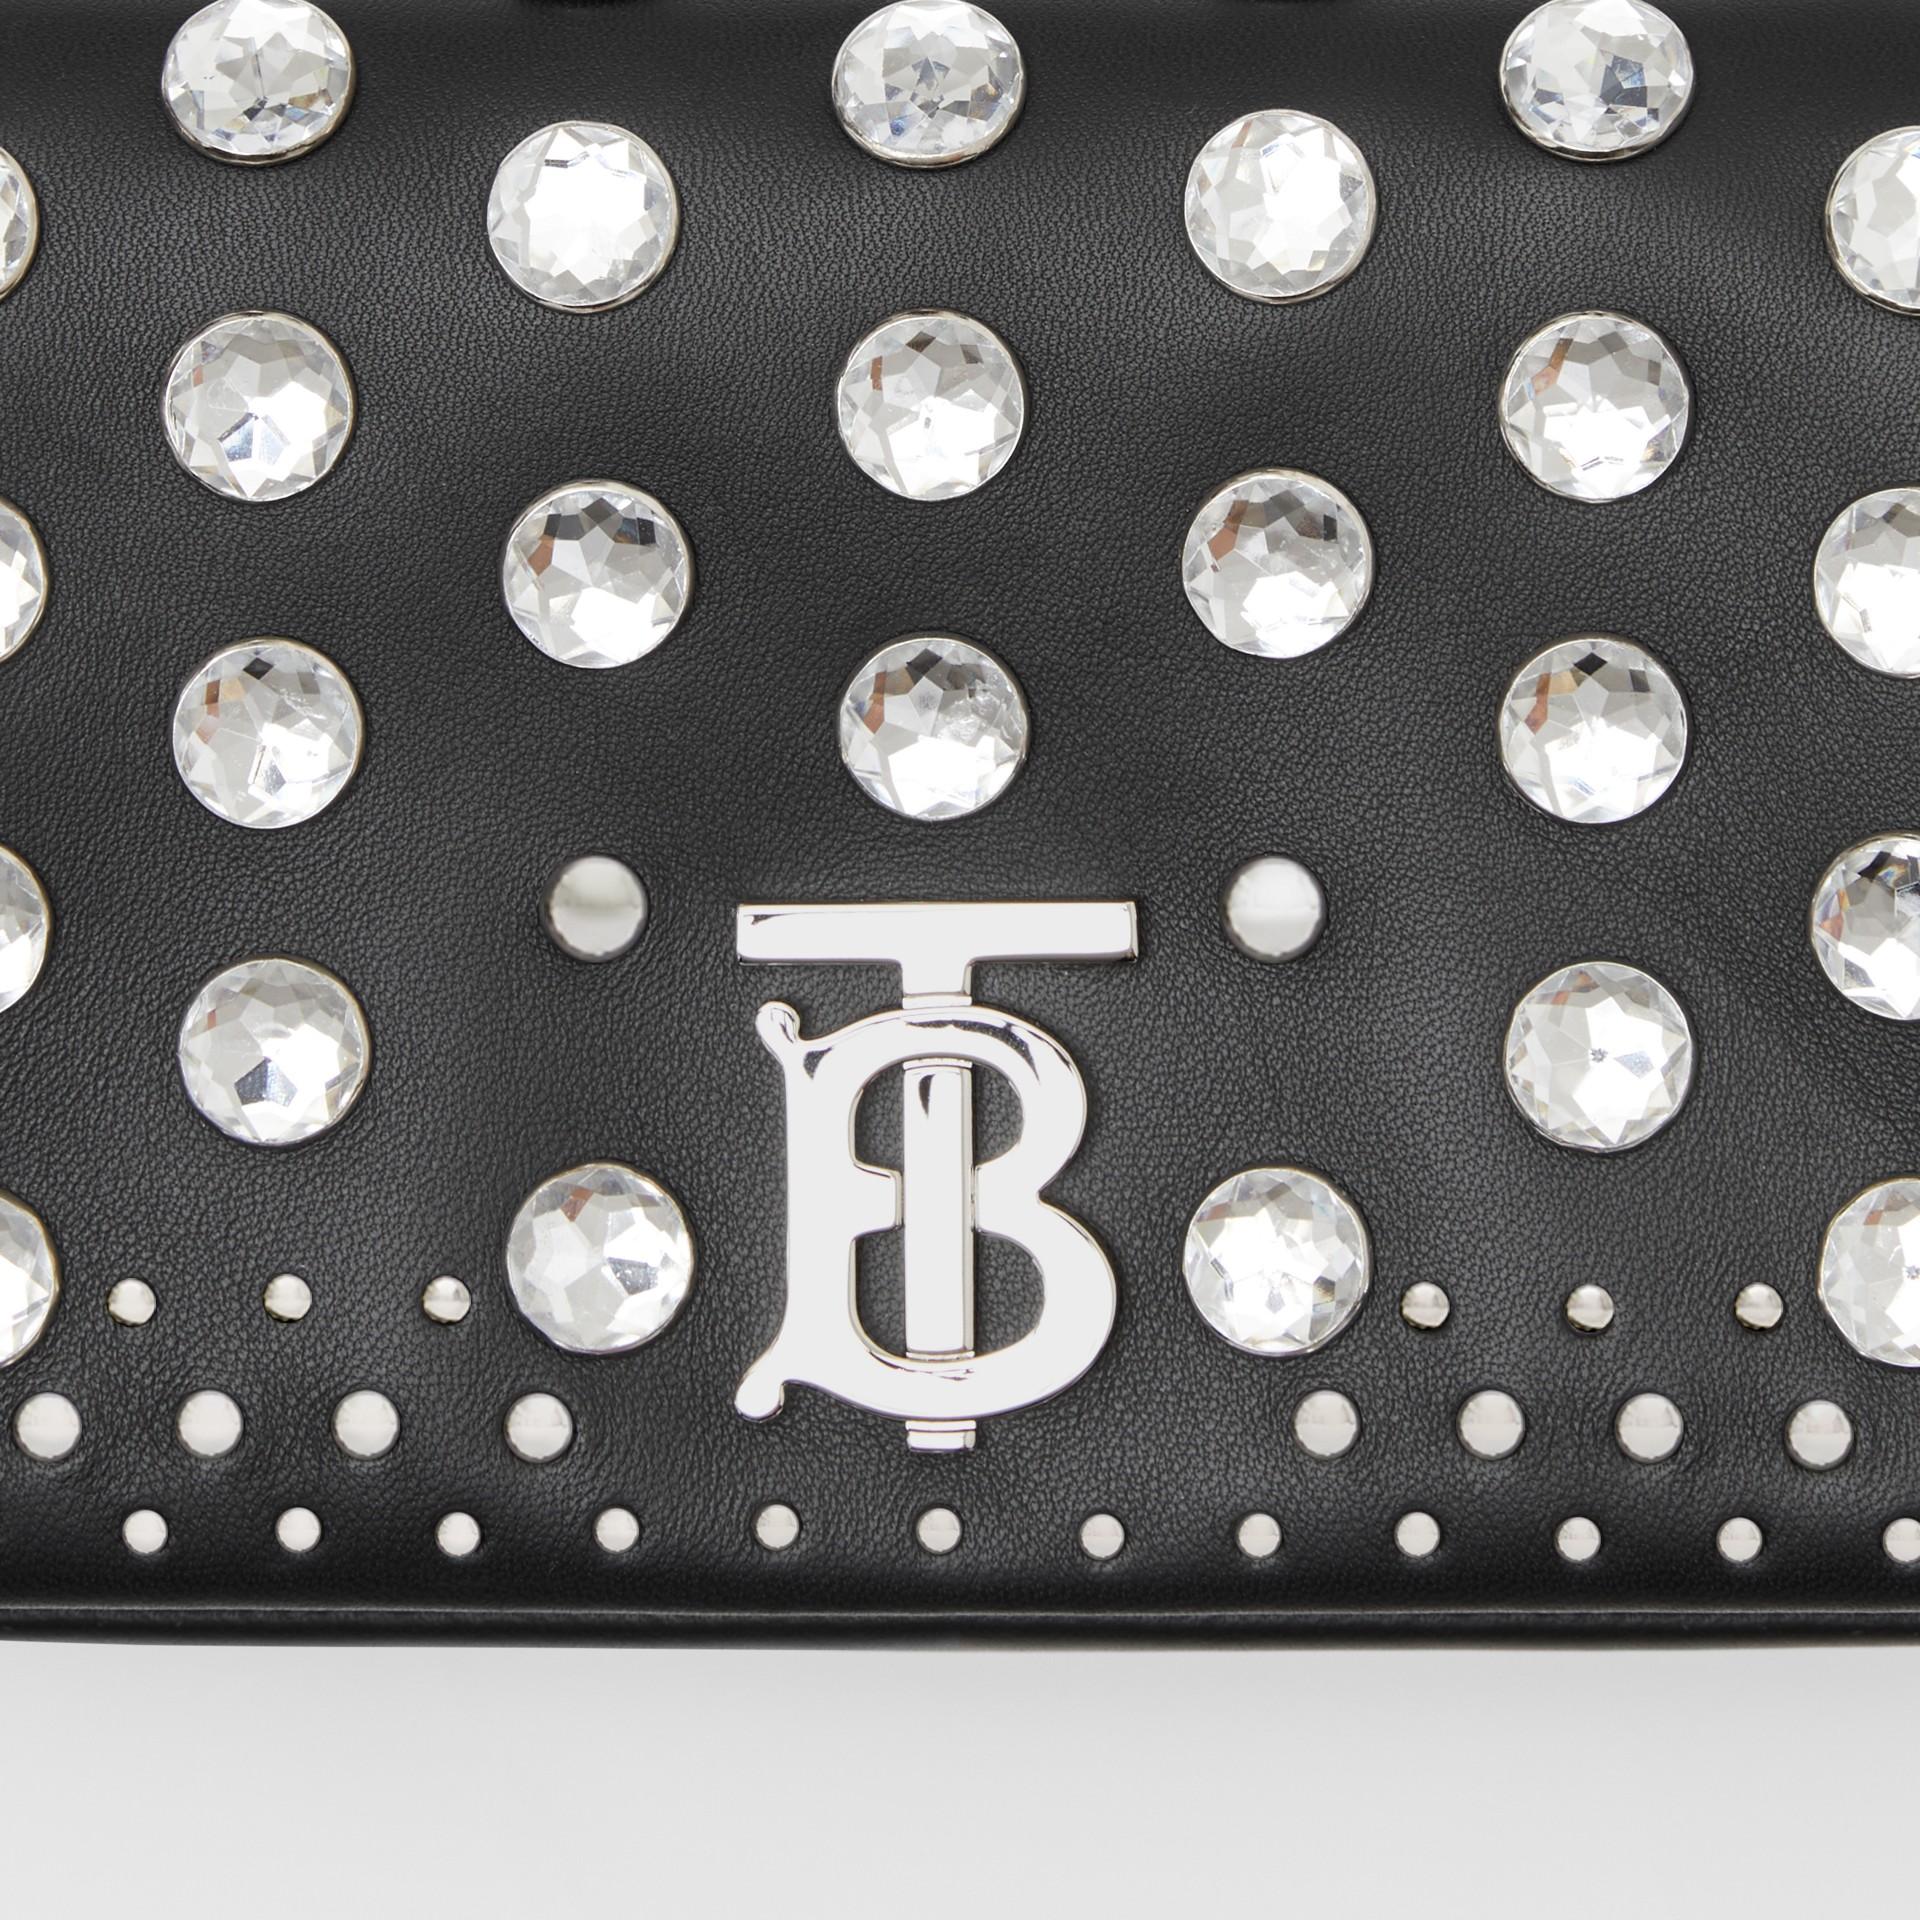 Small Embellished Lambskin Lola Bag in Black - Women | Burberry - gallery image 8